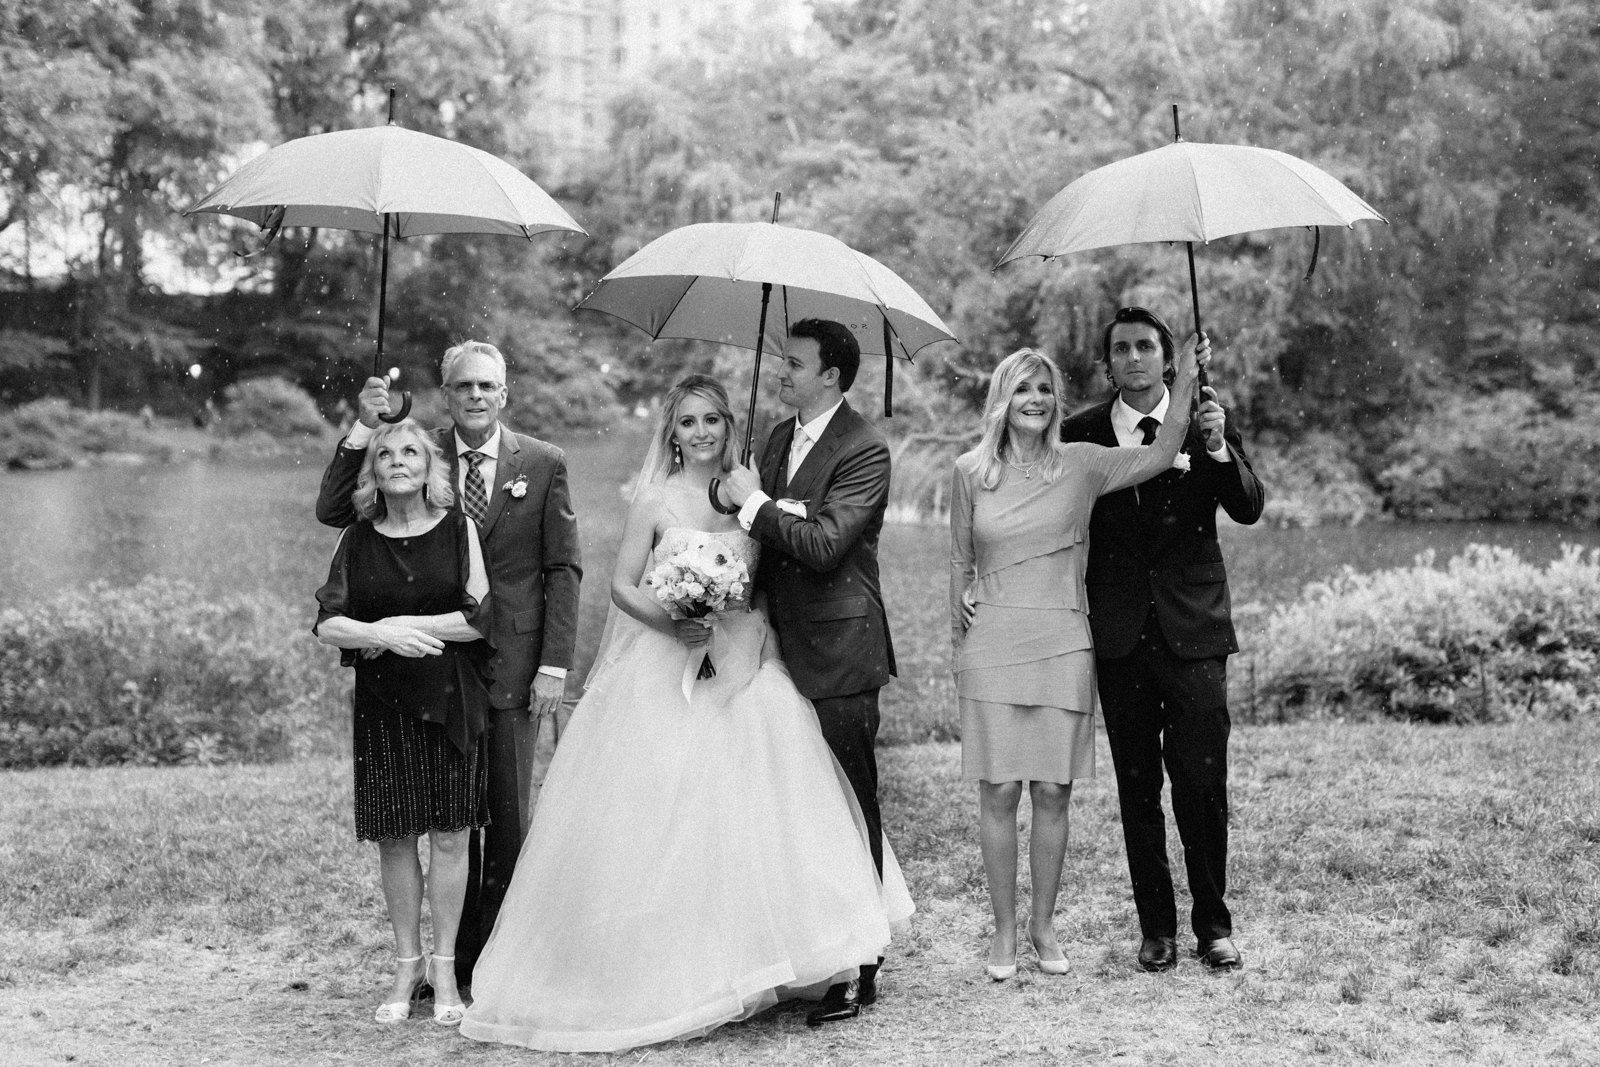 NYC Wedding Photography Sofitel Central Park Brooklyn Photographer Boris Zaretsky _B2C2501.jpg